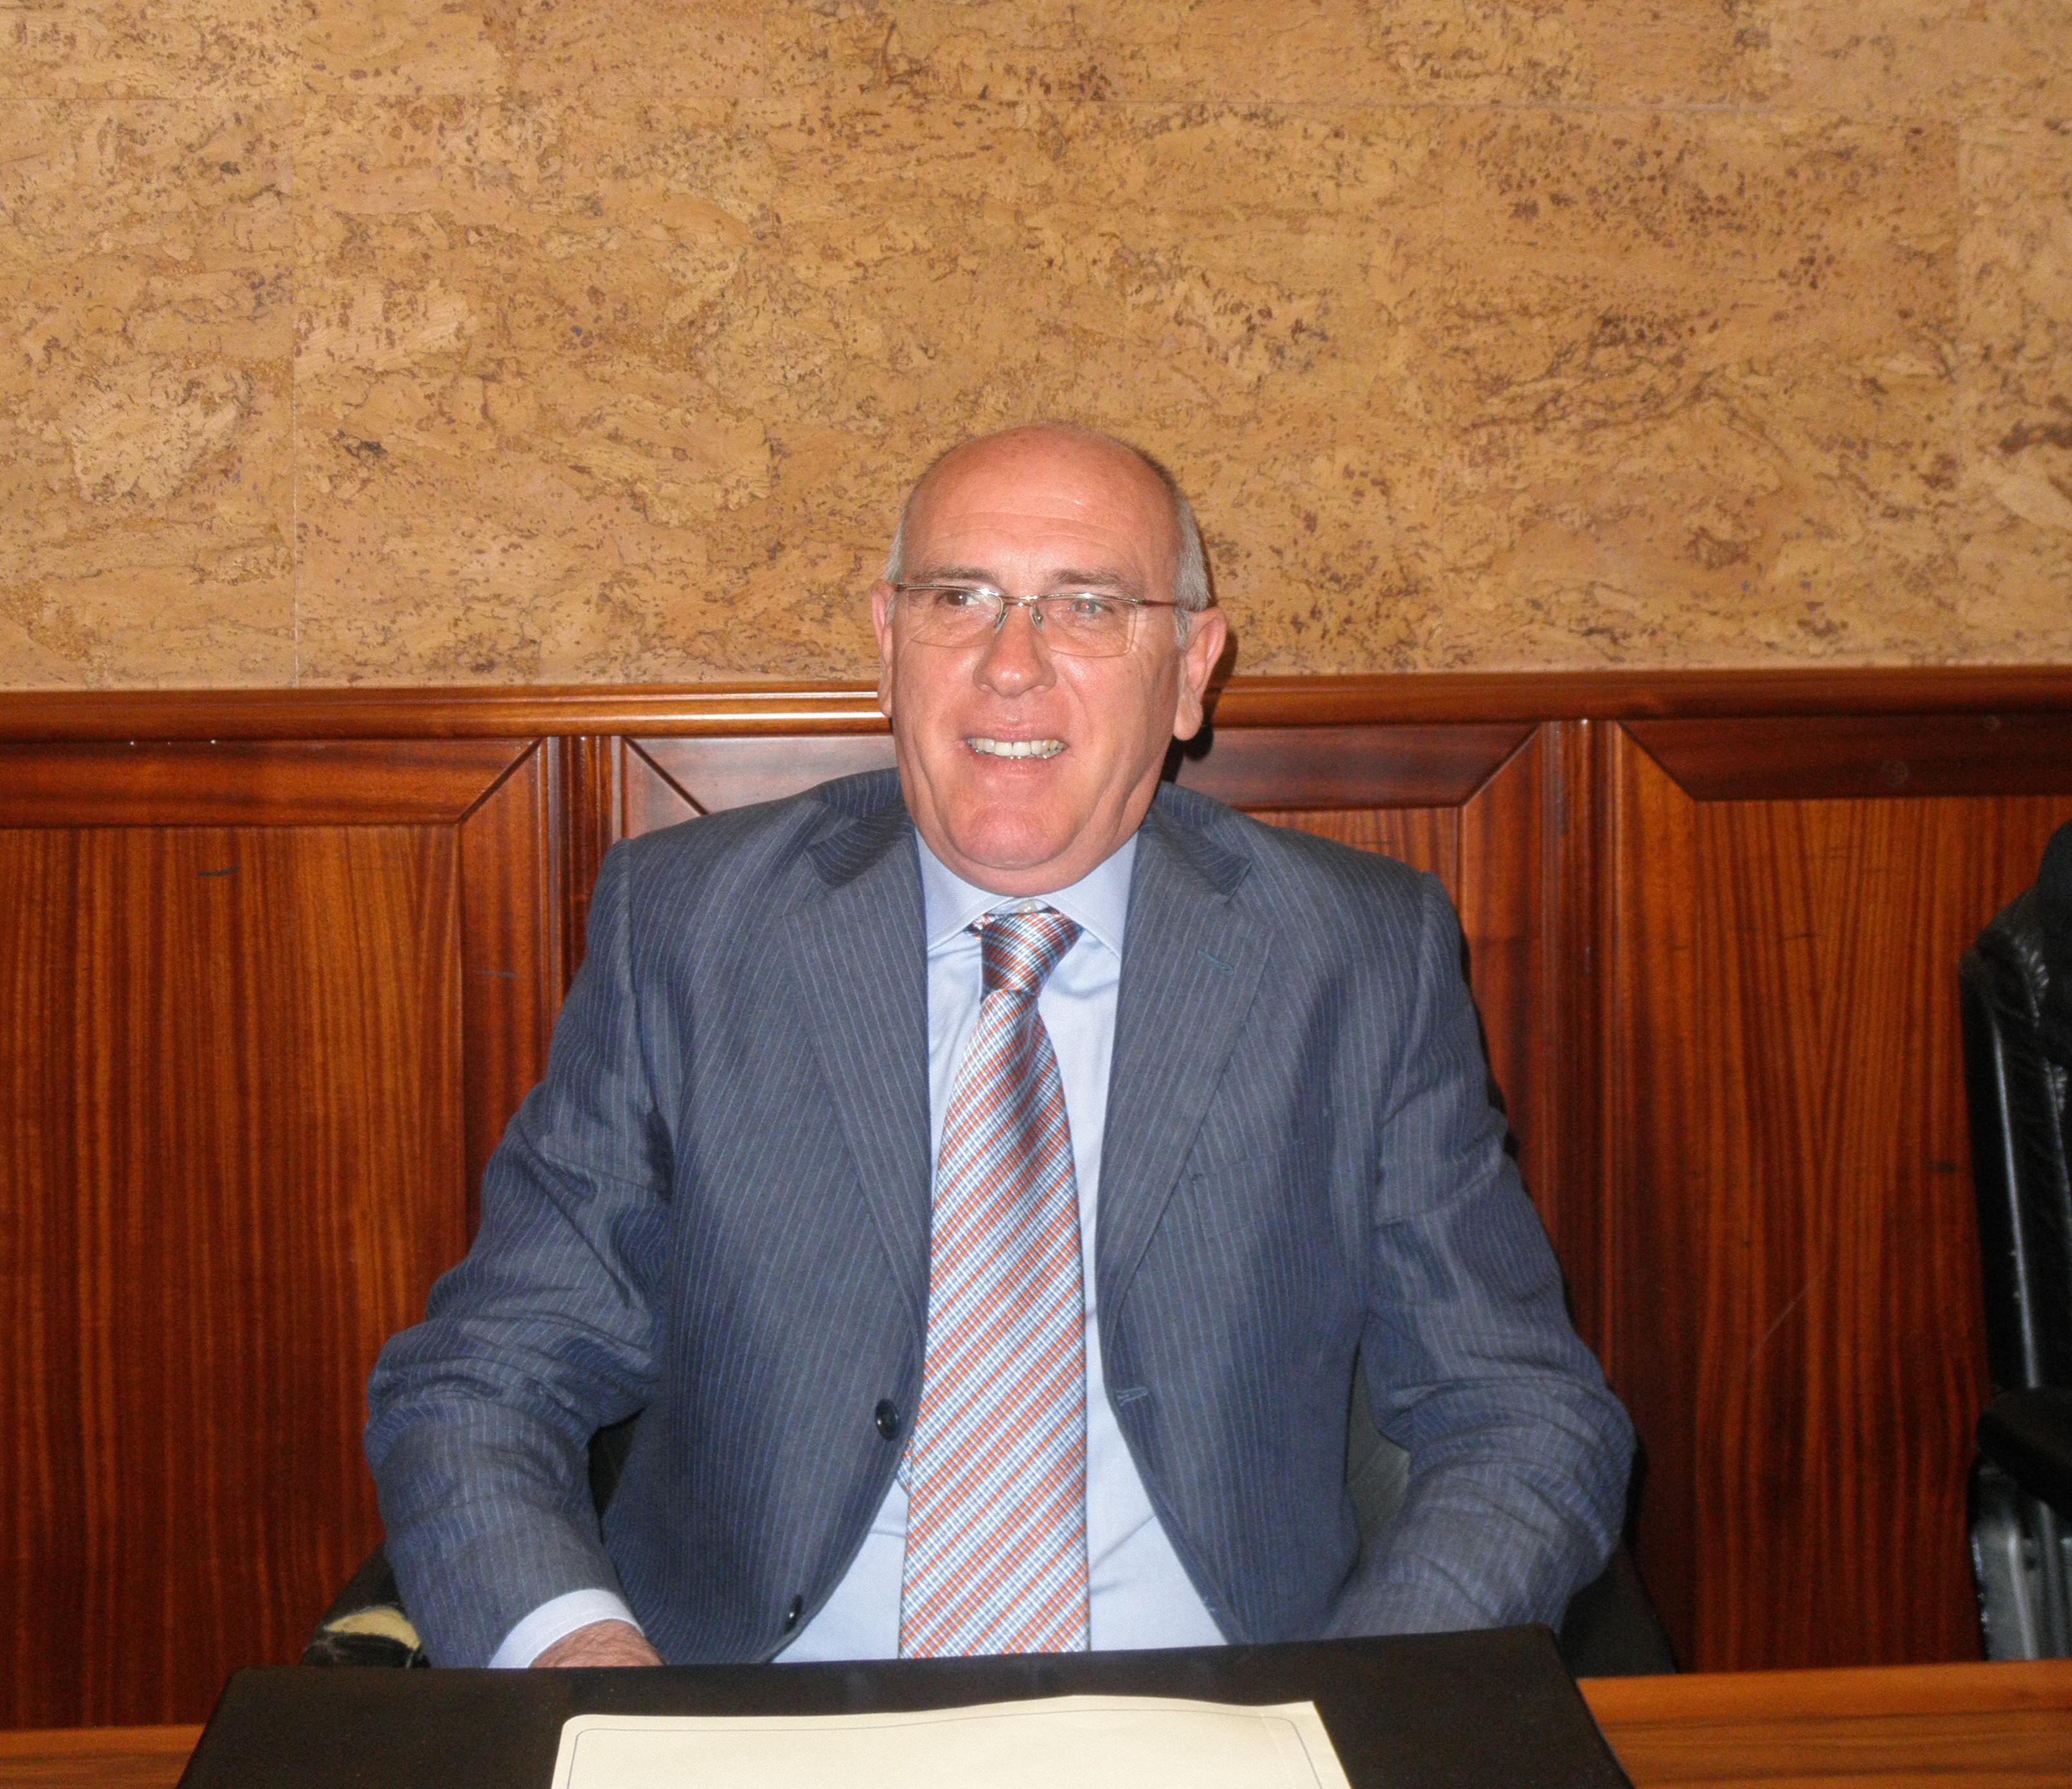 Arturo Galfano